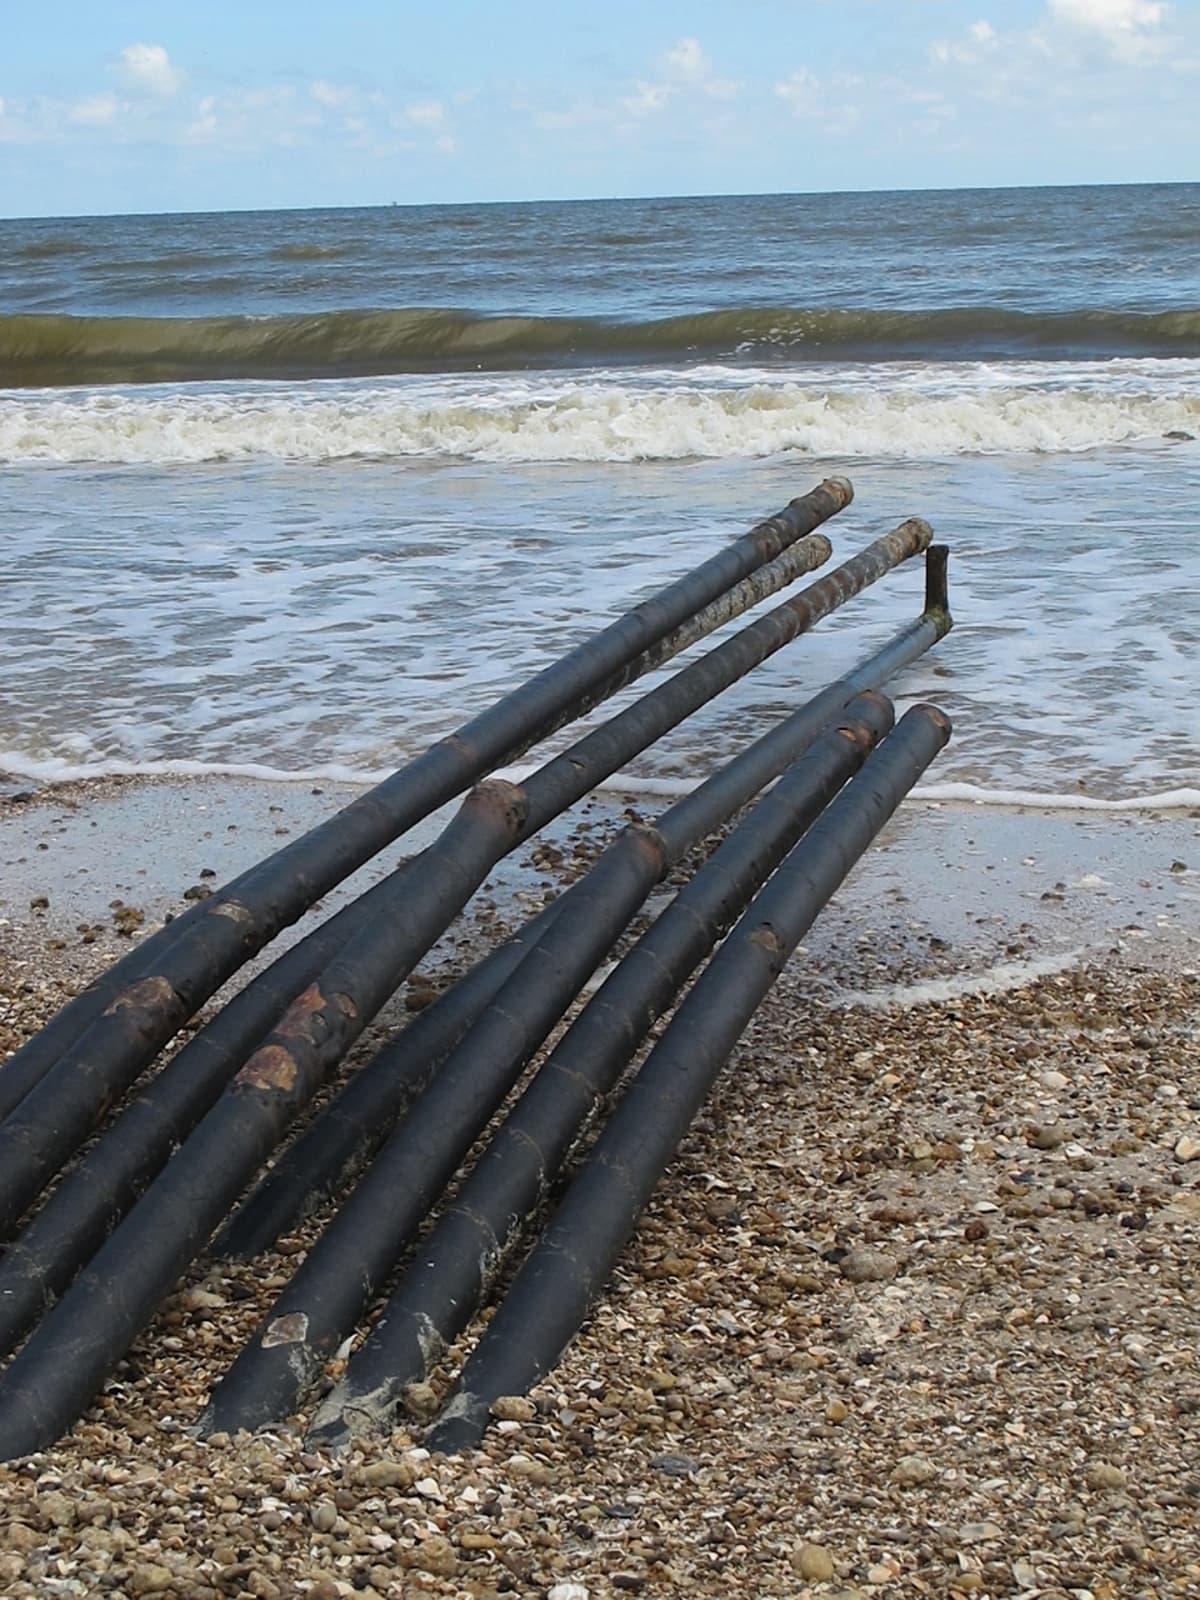 Bolivar oil seepage cluster of pipes